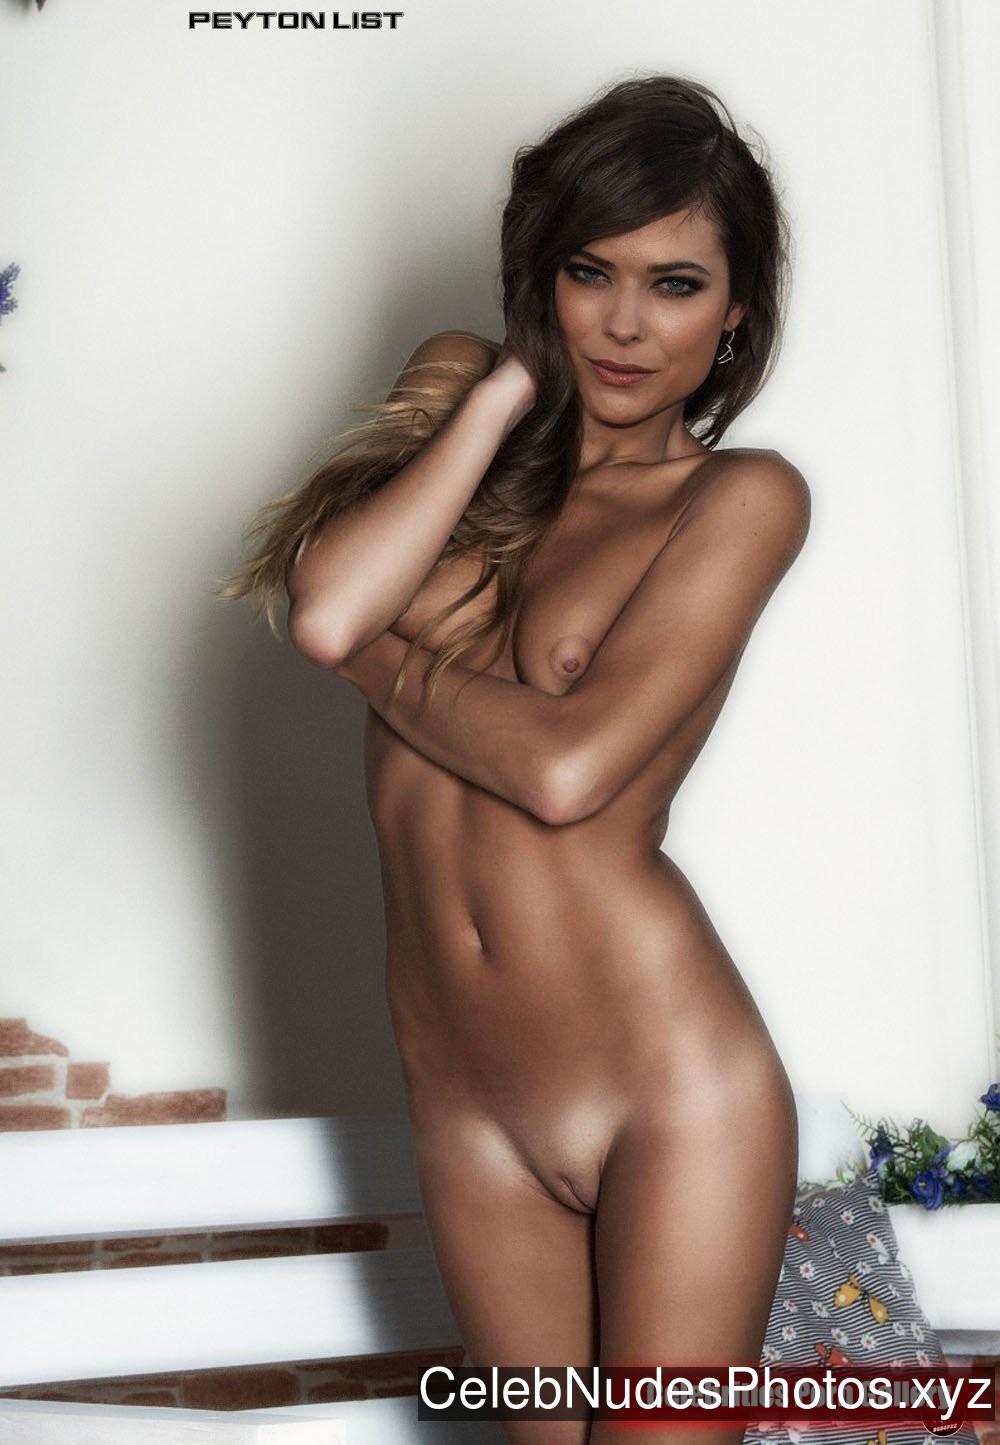 Peyton List Celebs Naked sexy 12